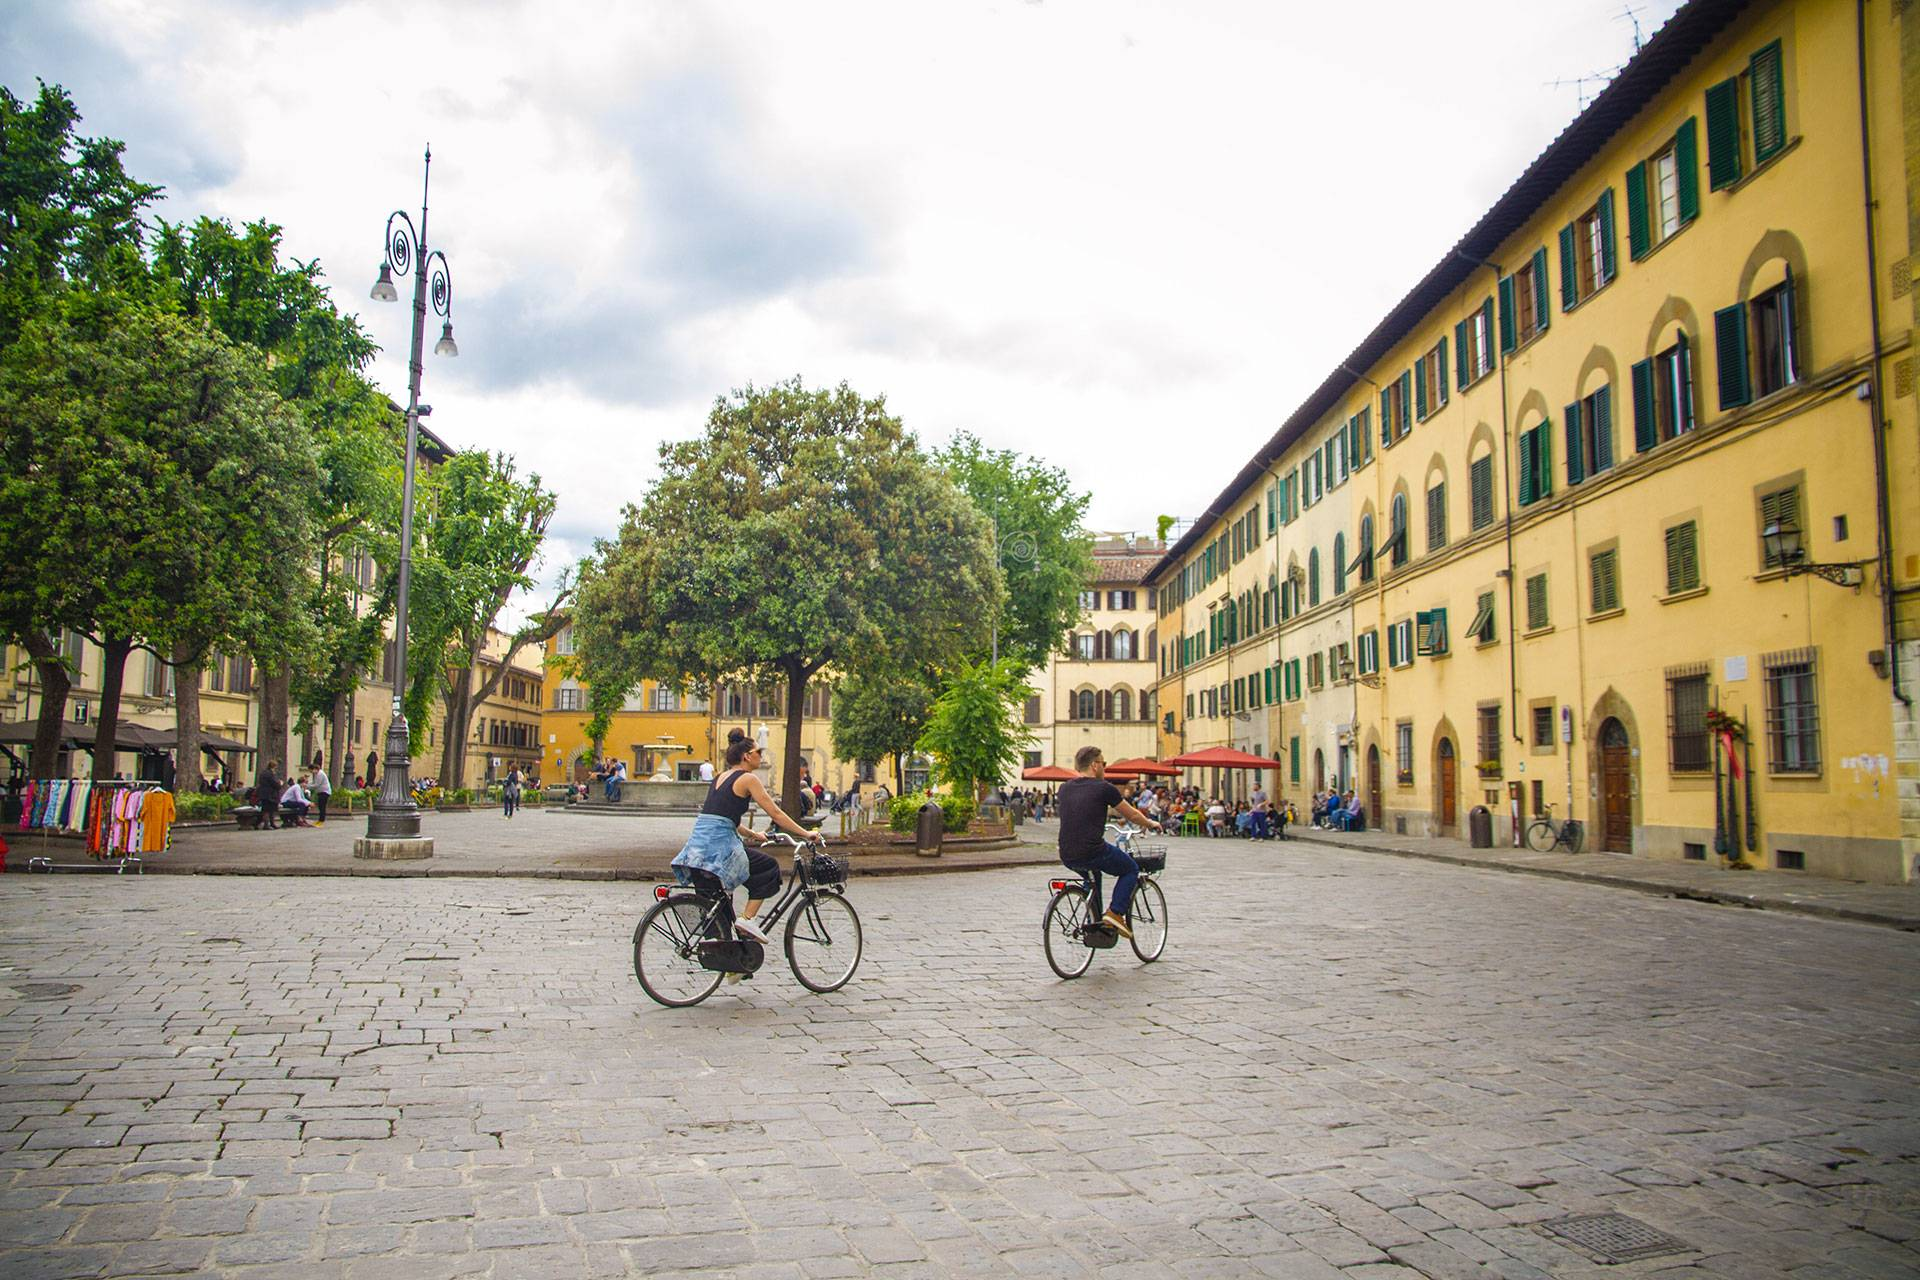 Photo 1: Bien manger à Florence : Sans gluten